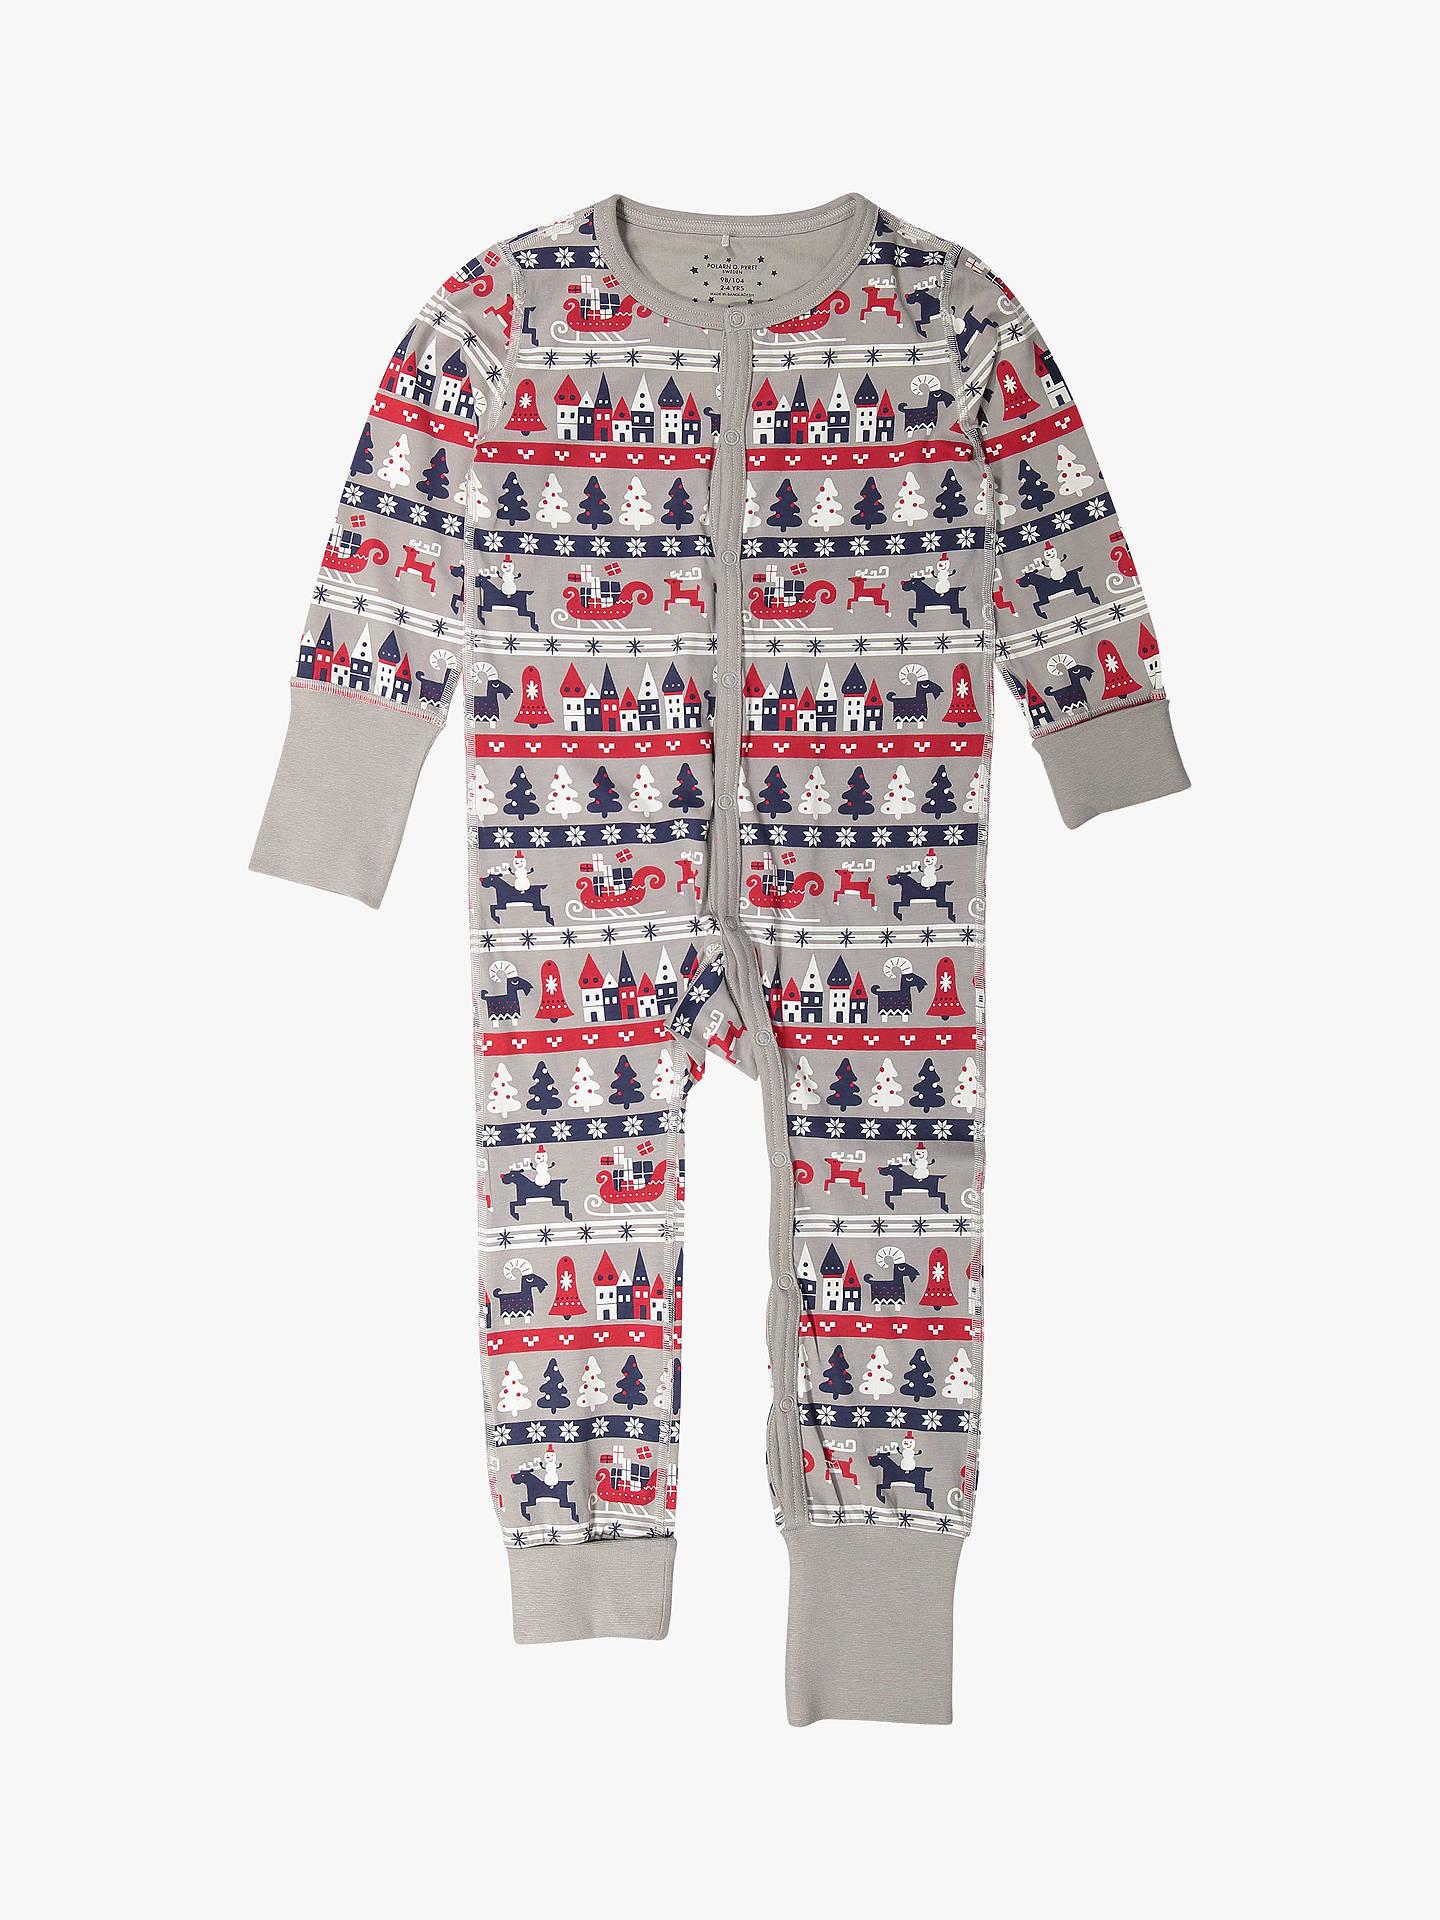 0563dd919 Polarn O. Pyret GOTS Organic Cotton Children s Xmas Onesie